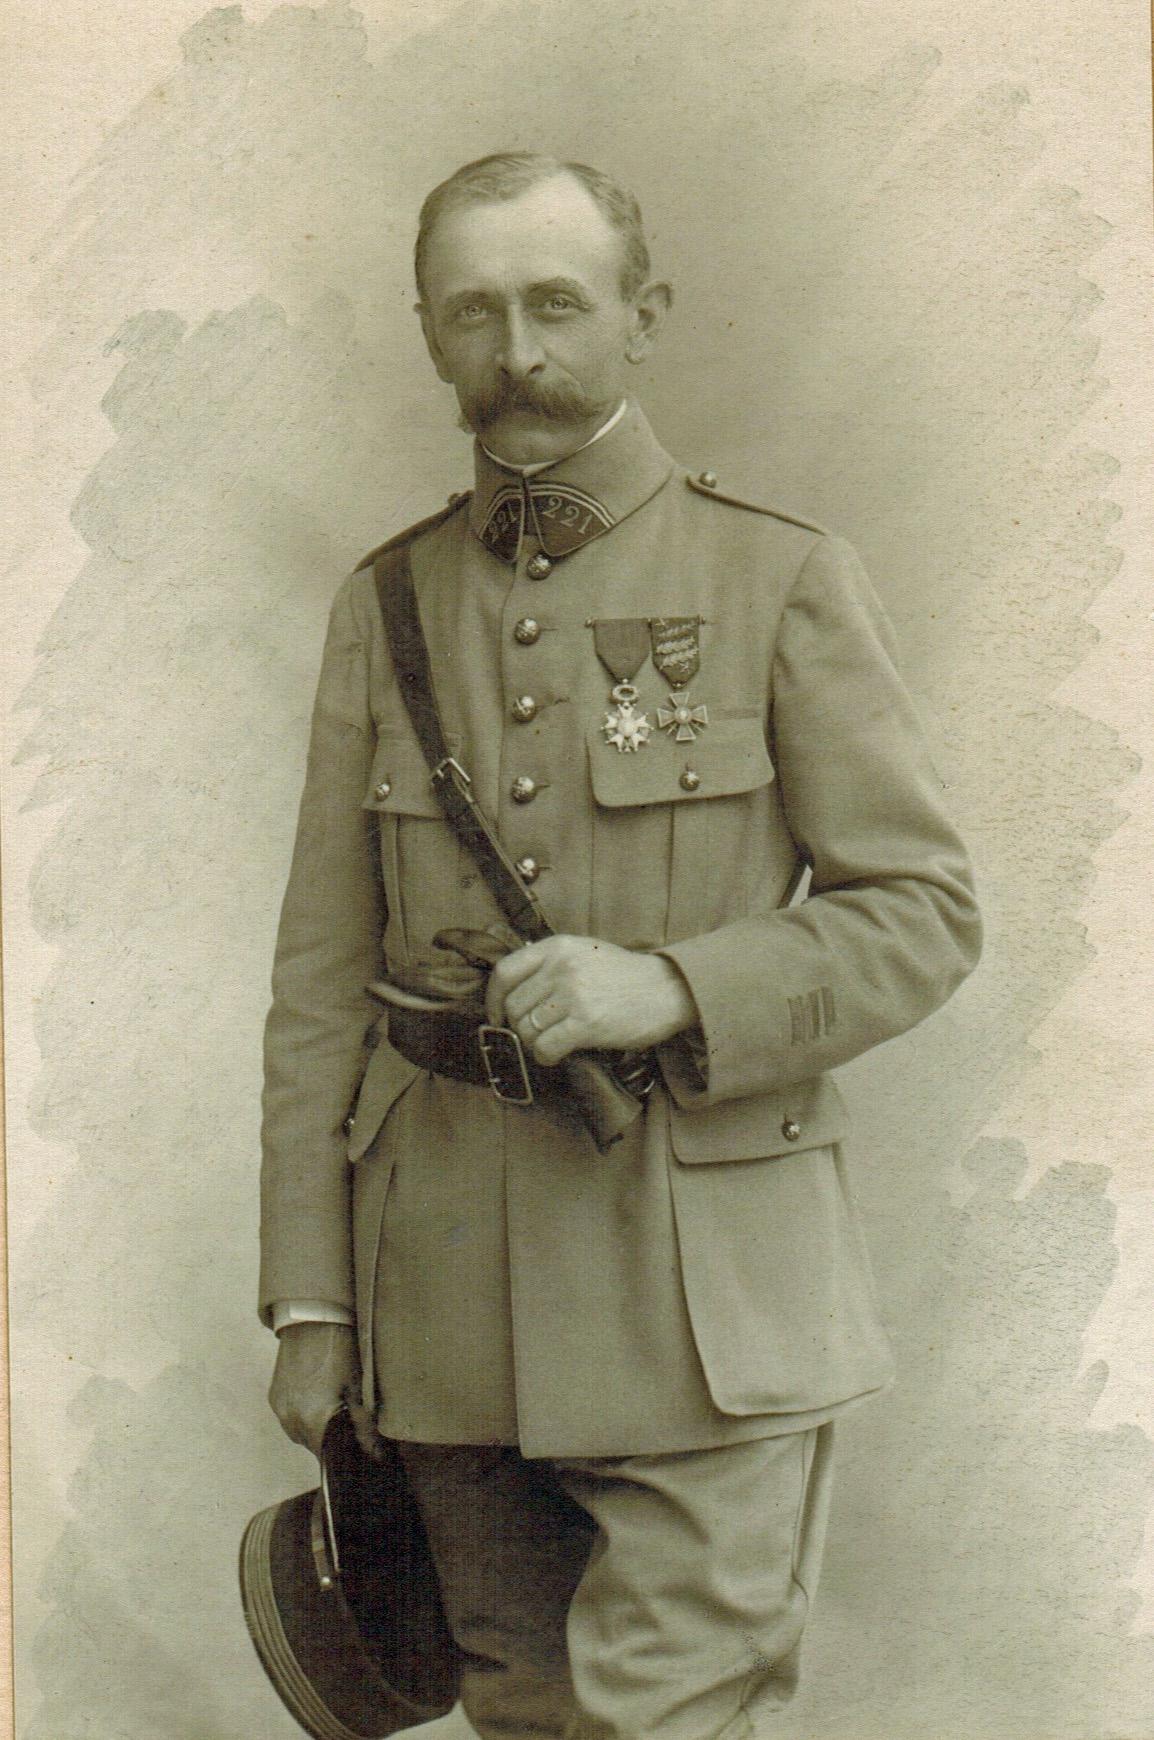 1918-1919 Favre Edouard BEST rogne Photoshop.jpg